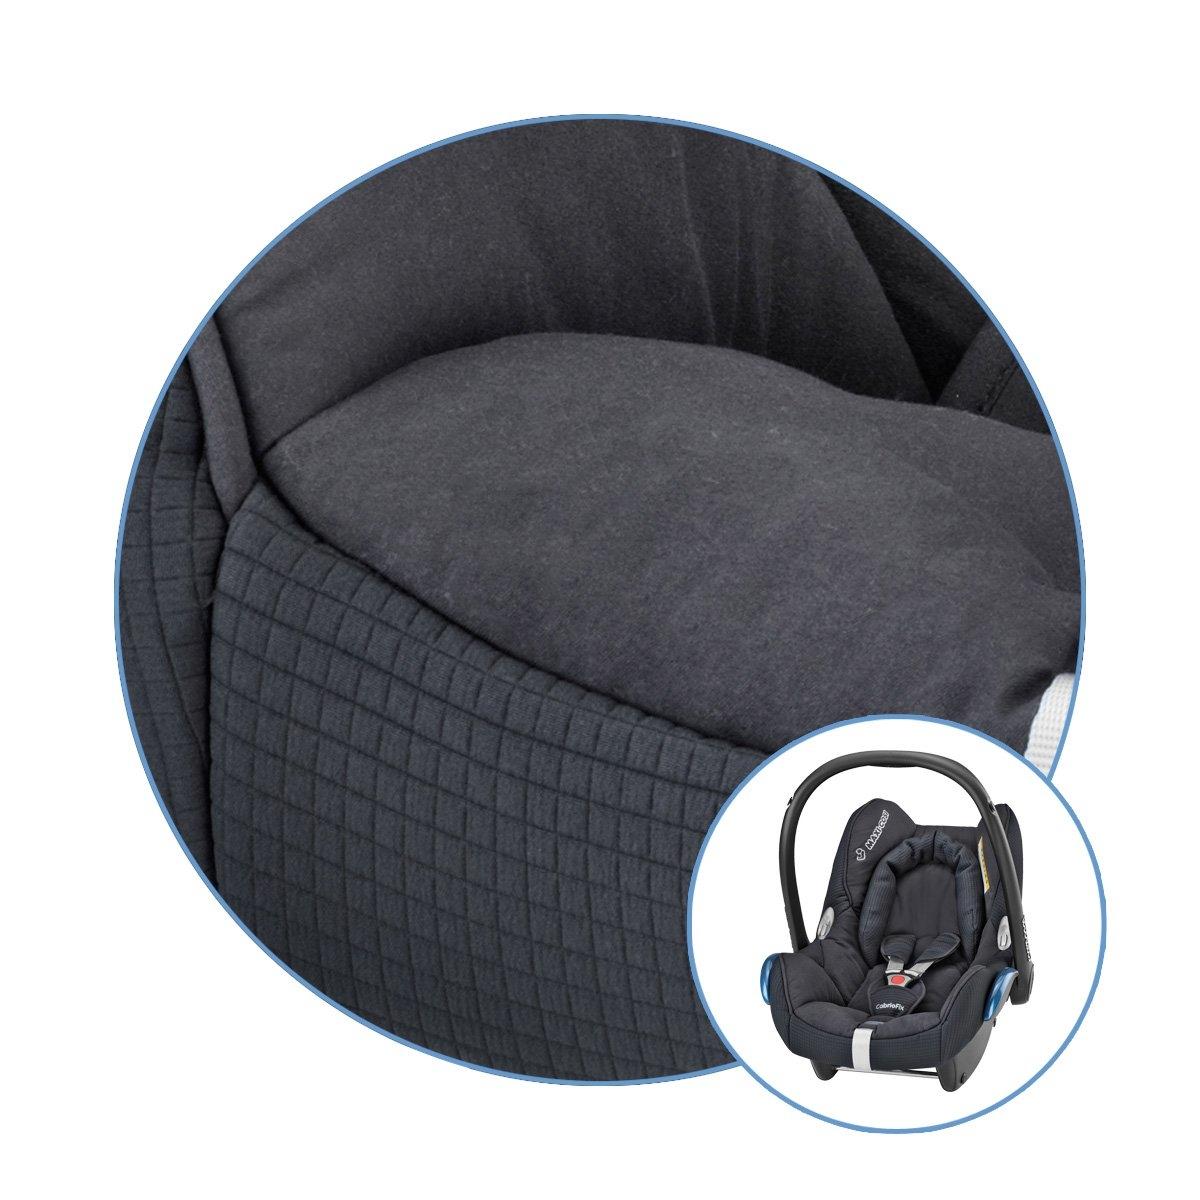 maxi cosi ersatzbezug f r babyschale cabriofix design 2014. Black Bedroom Furniture Sets. Home Design Ideas